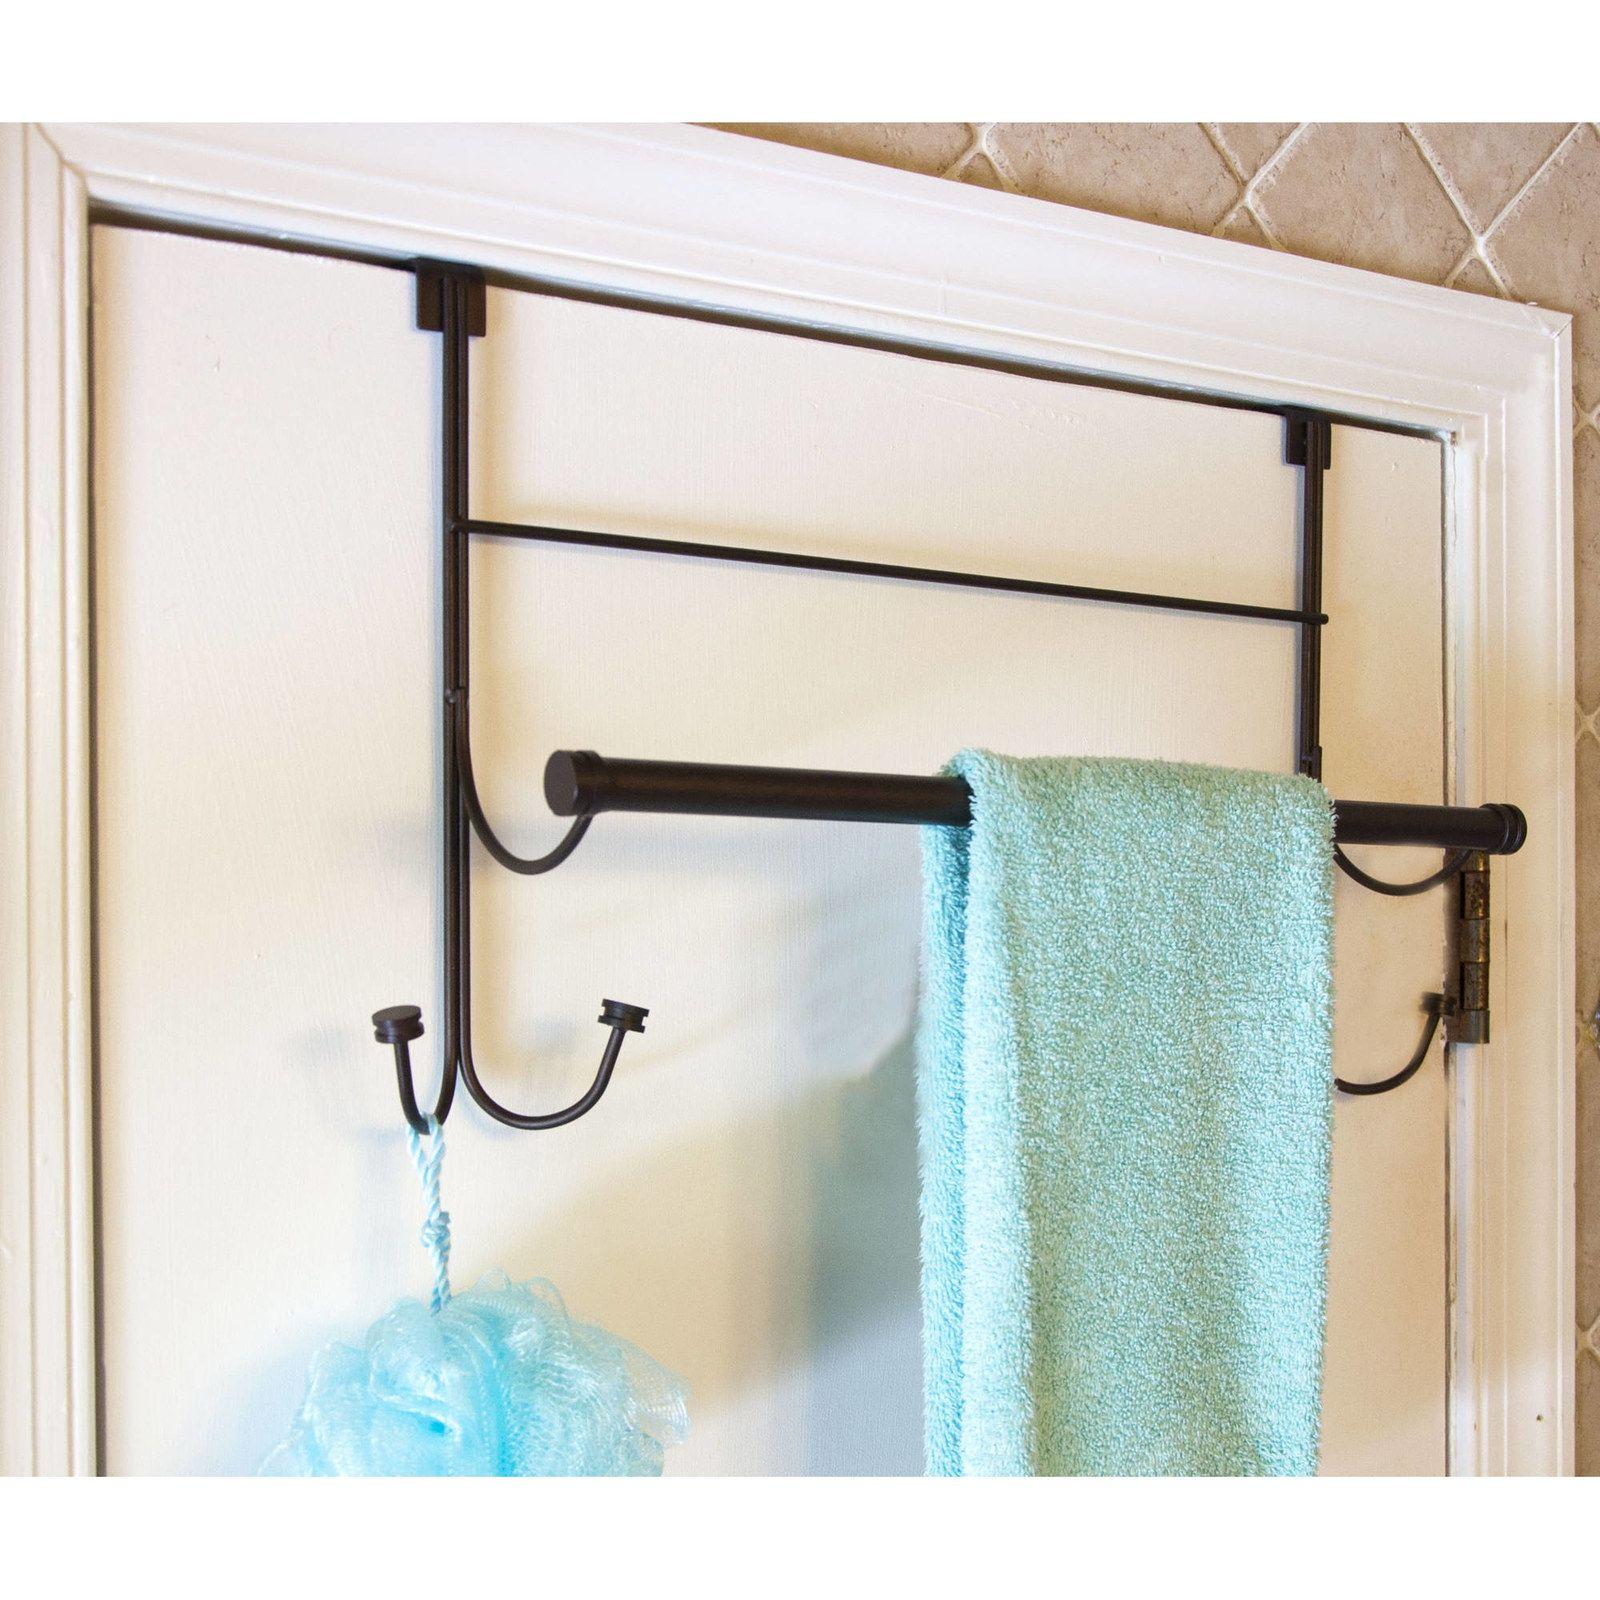 24 Tips That Will Make Dorm Living Much Easier Towel Rack Over The Door Hanger Towel Hooks